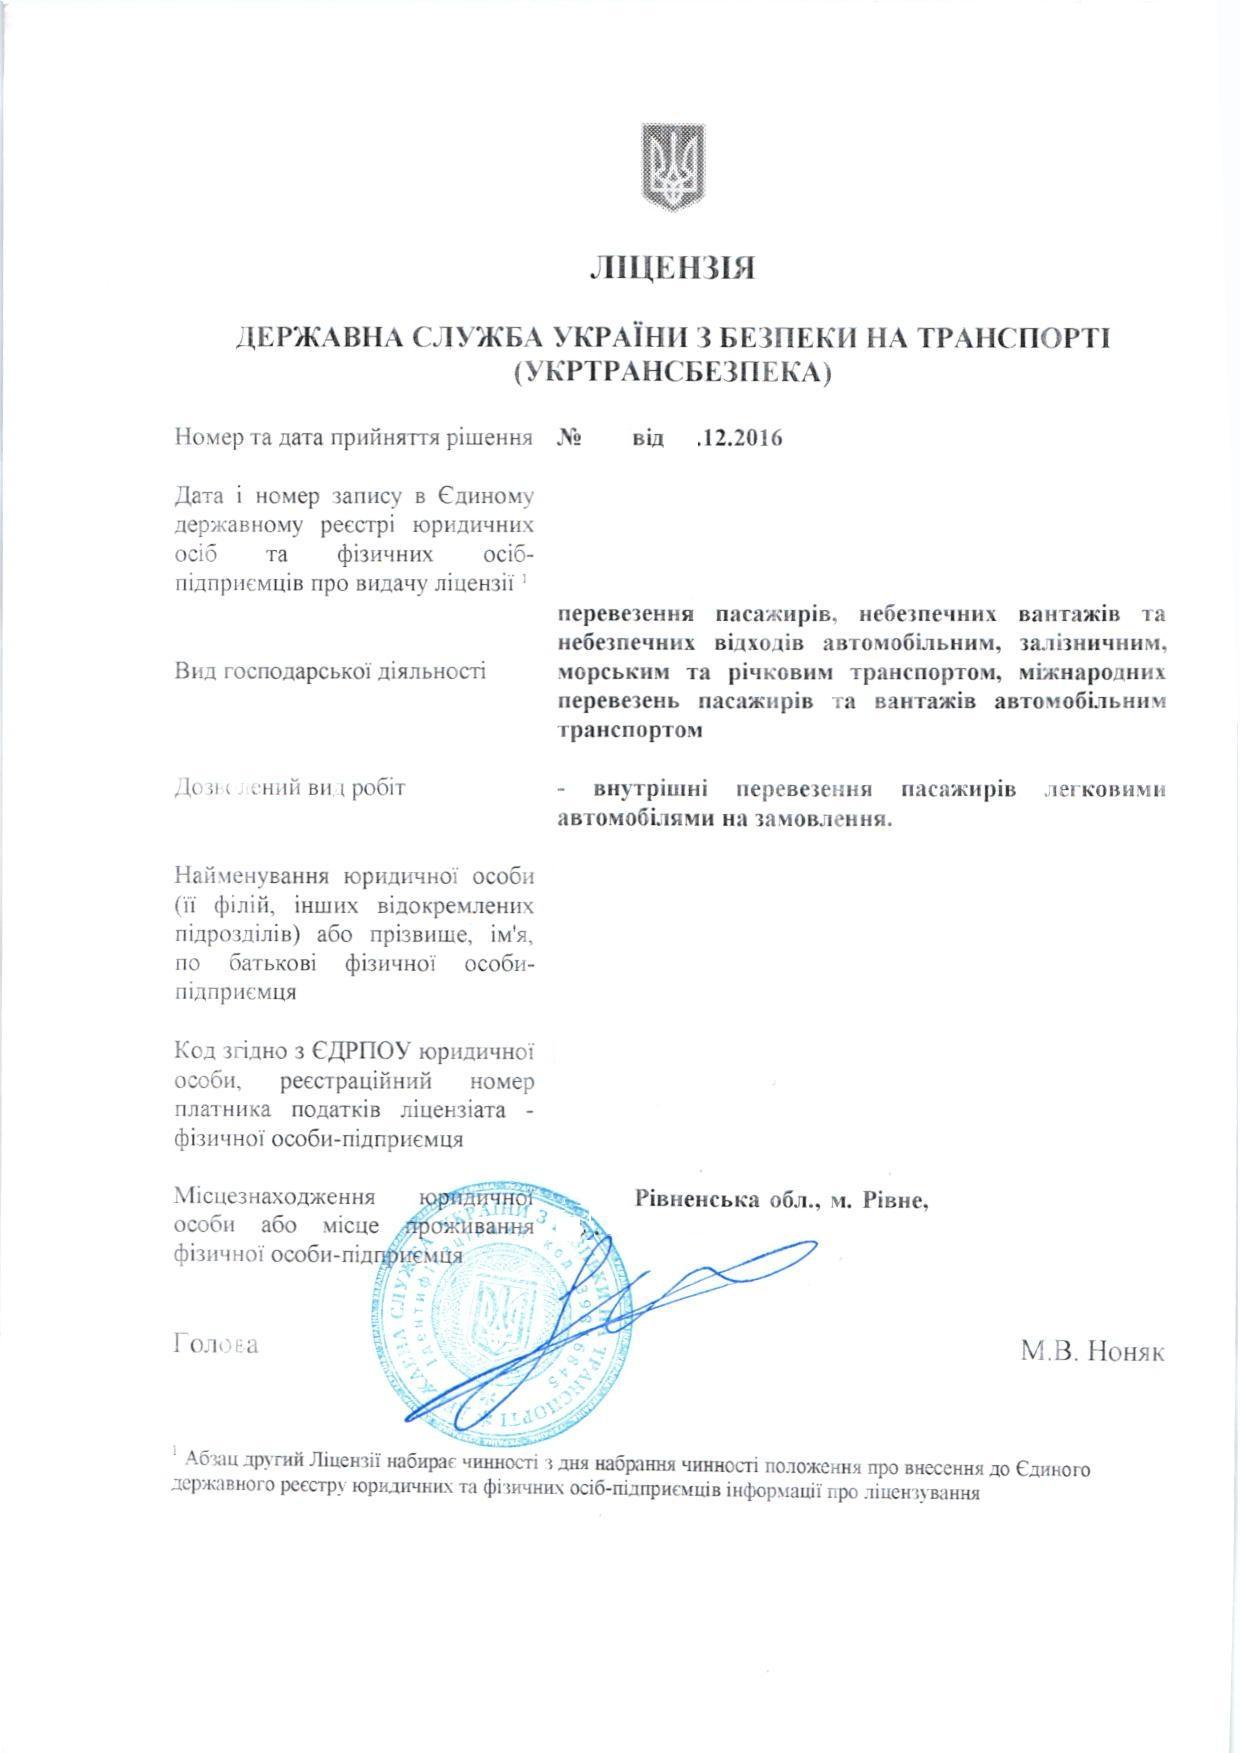 бланк путевого листа пассажирские перевозки по украине